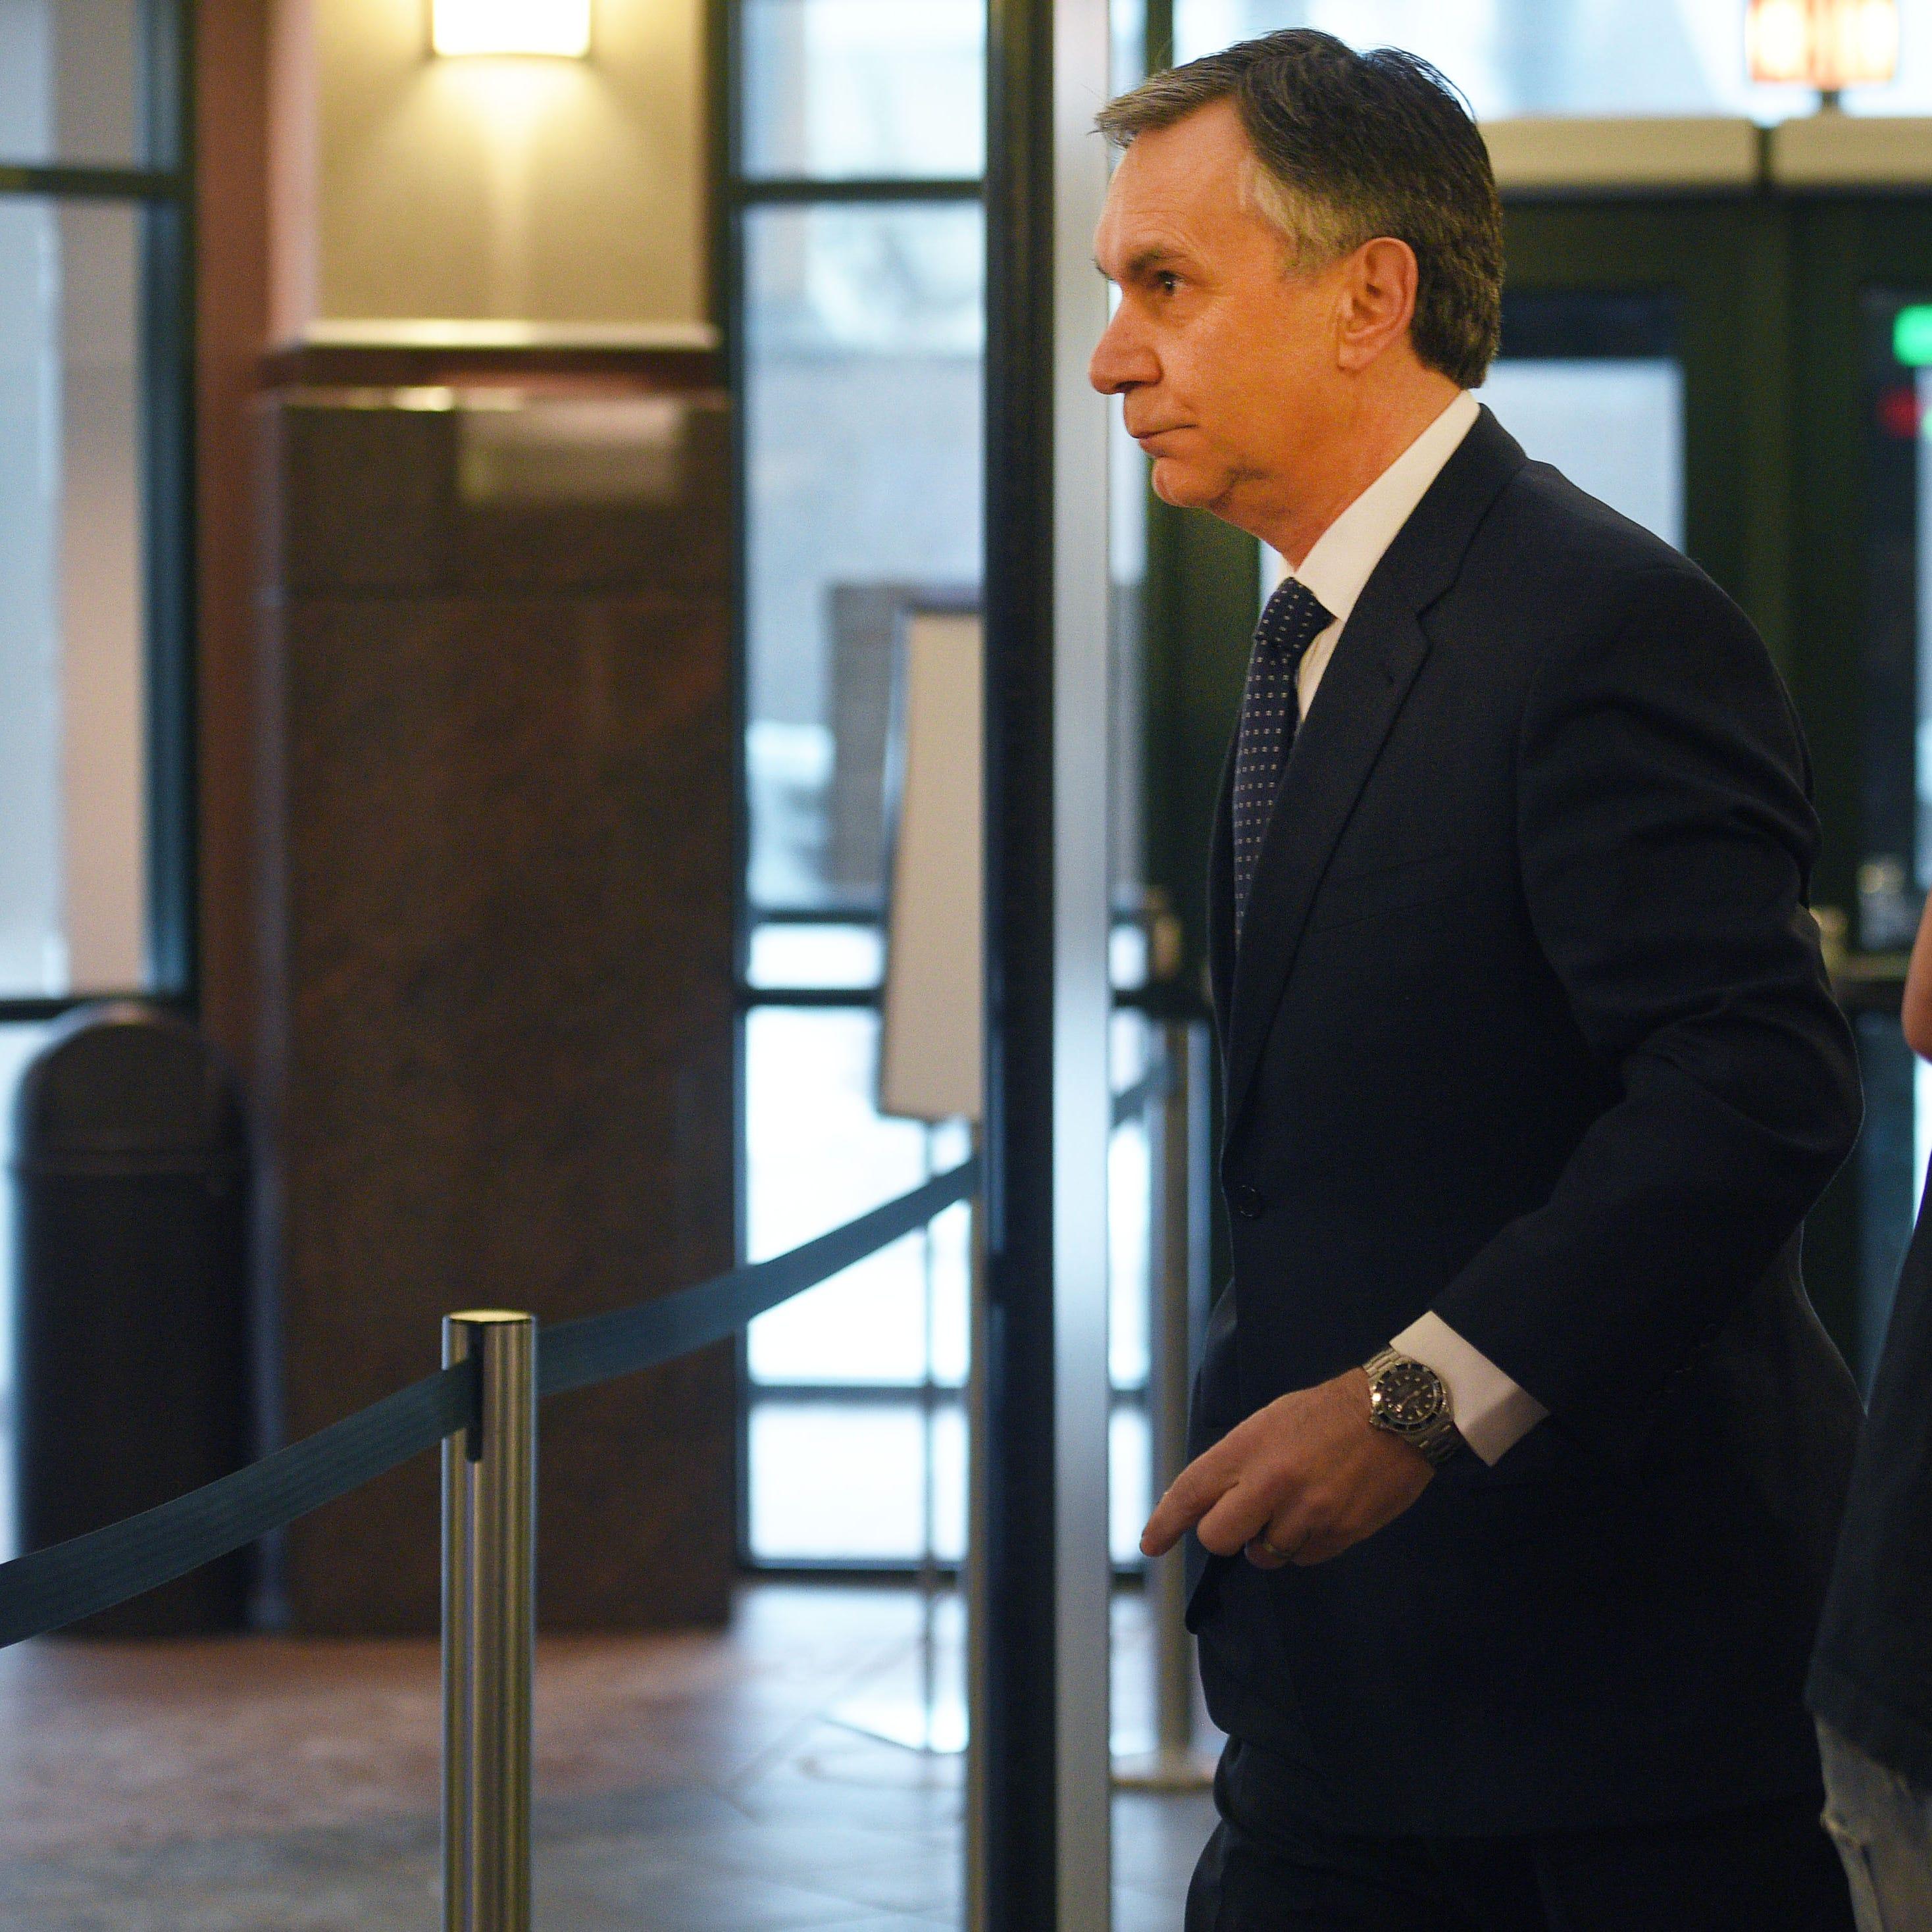 Jim Sideras will keep $9,500 monthly pension despite child porn conviction